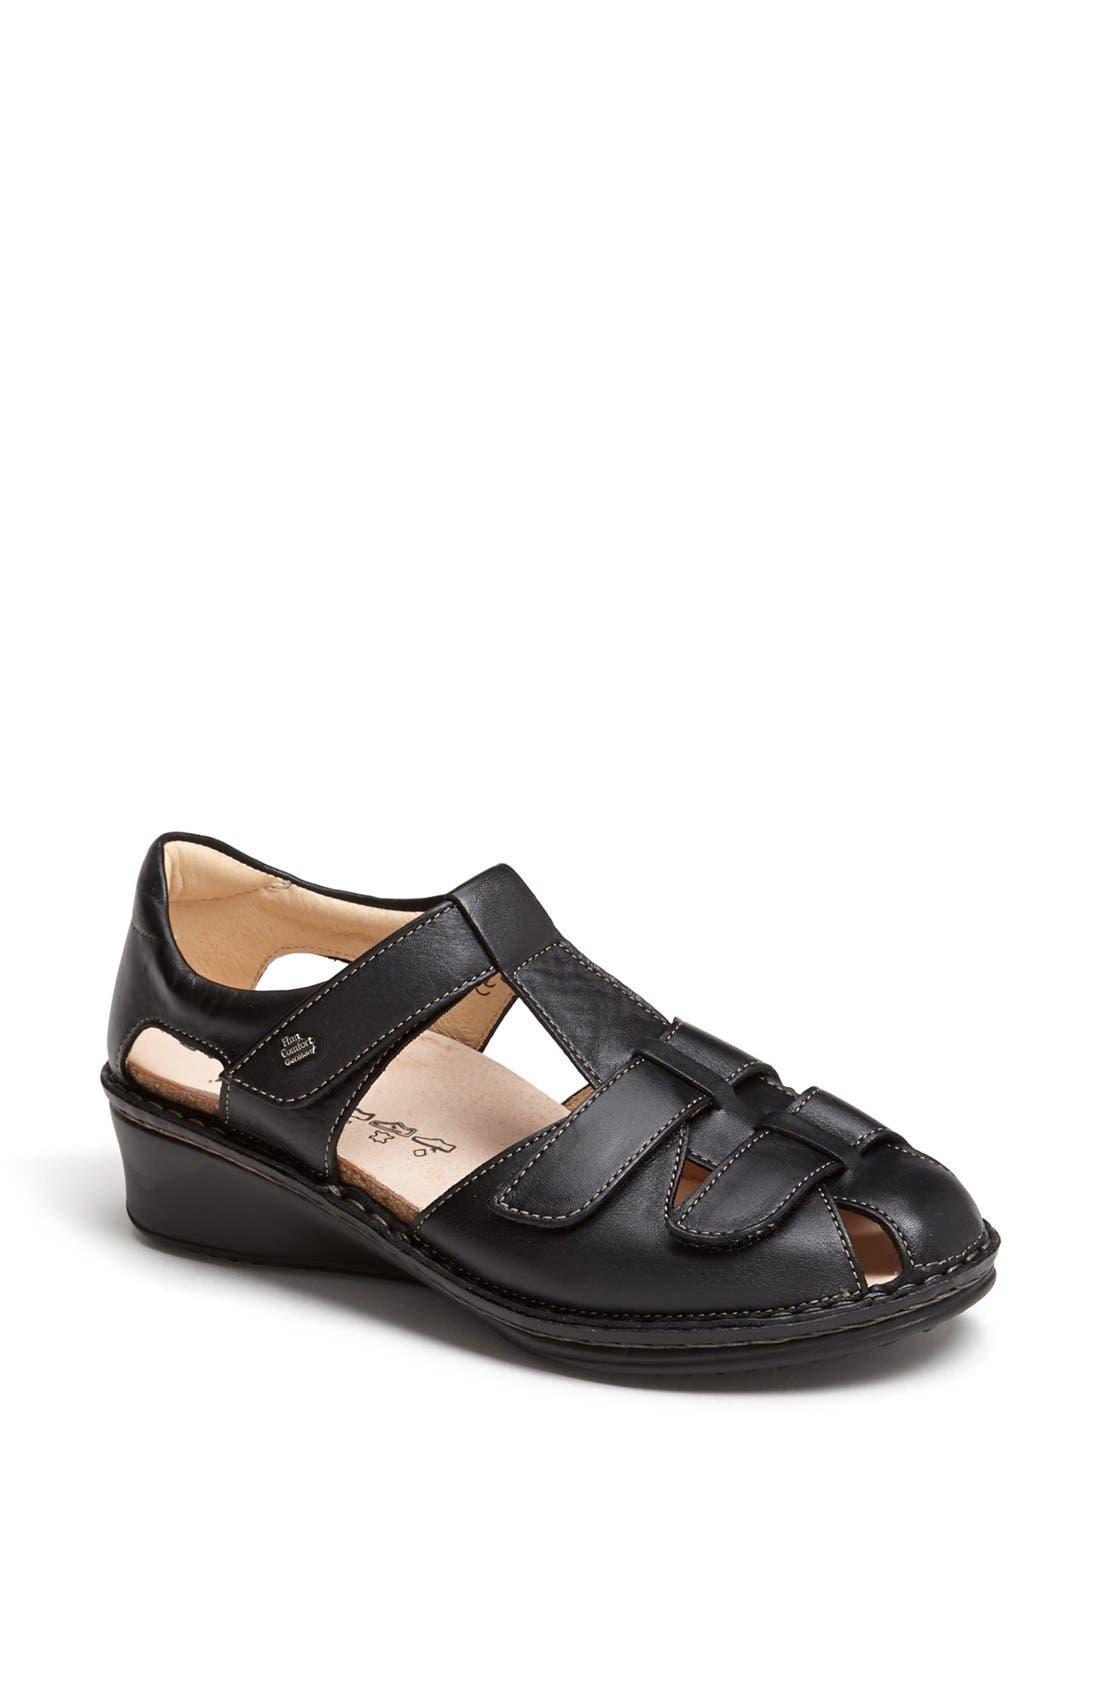 'Funnen' Sandal,                             Main thumbnail 1, color,                             BLACK